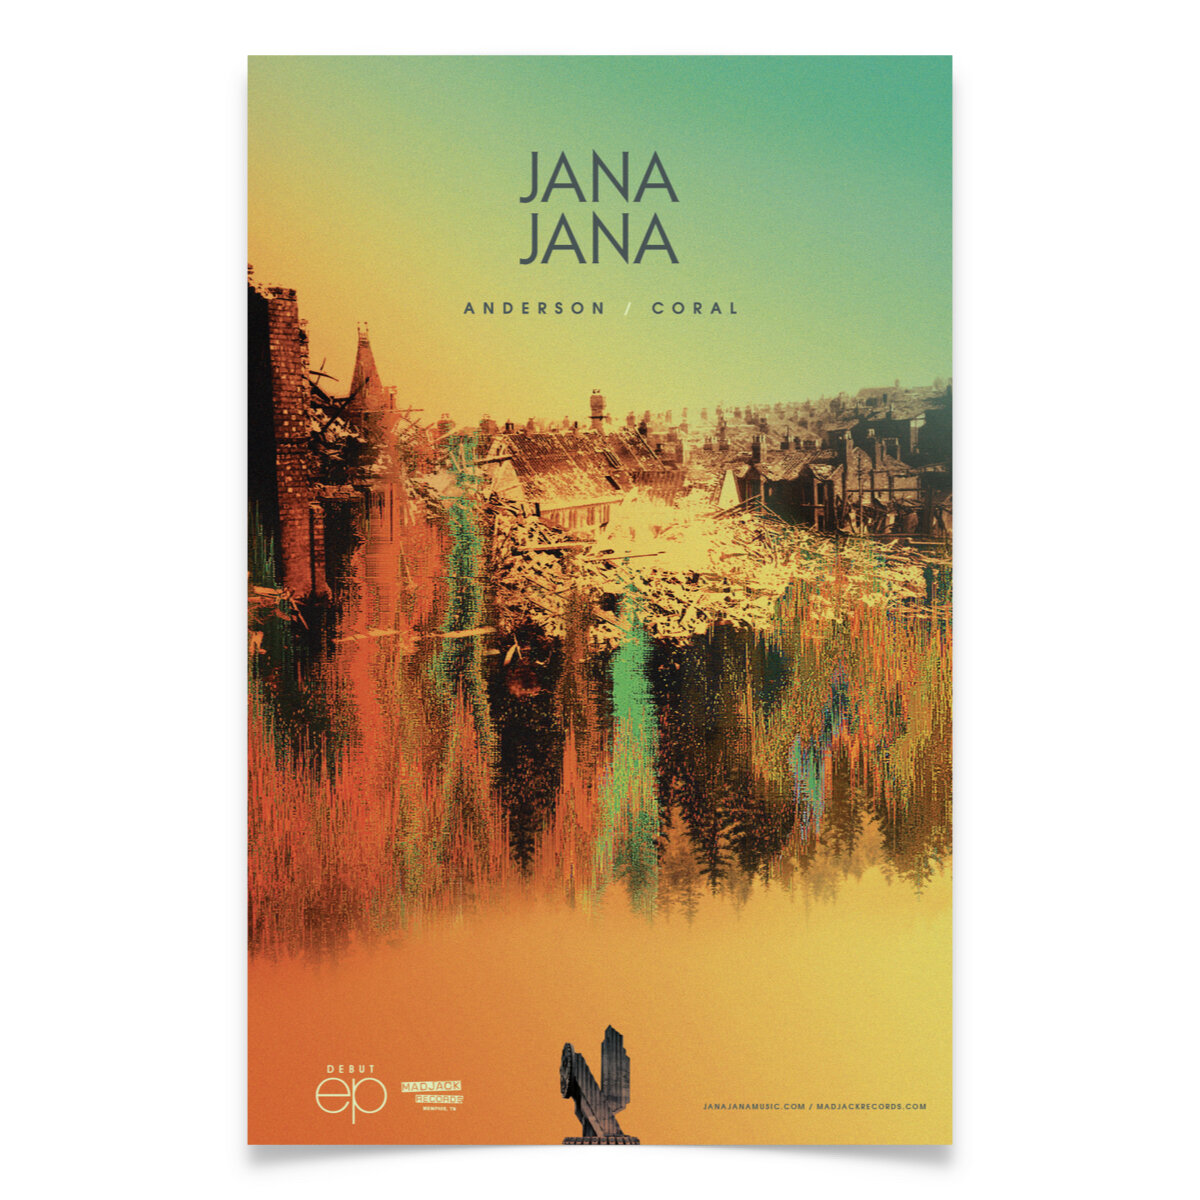 JANAJANA-TourPoser.001.jpeg